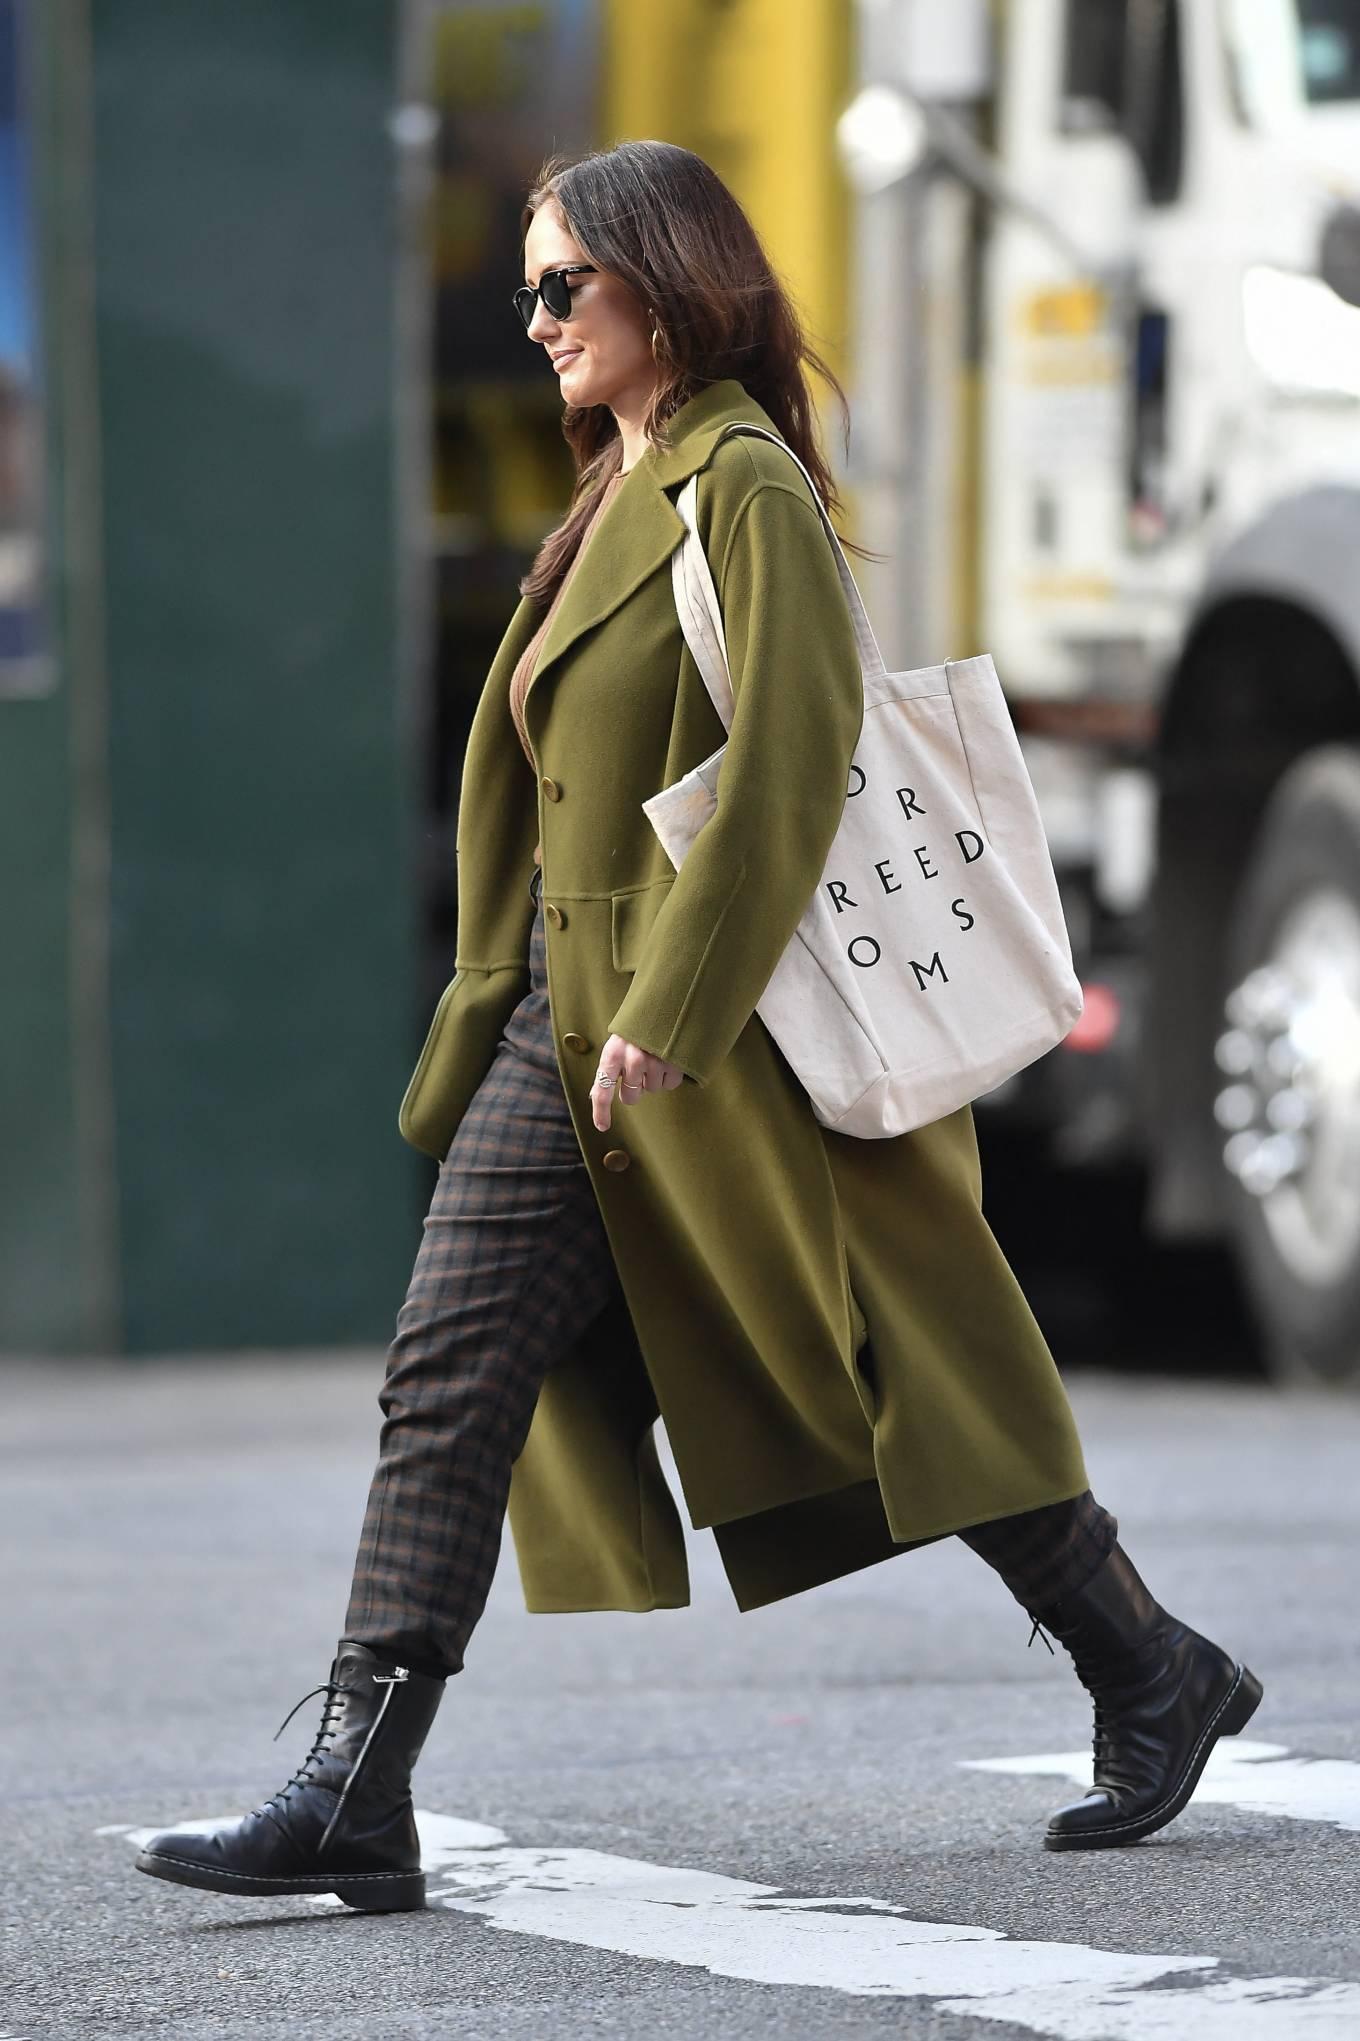 Minka Kelly 2021 : Minka Kelly – In olive green runs errands in New York-01